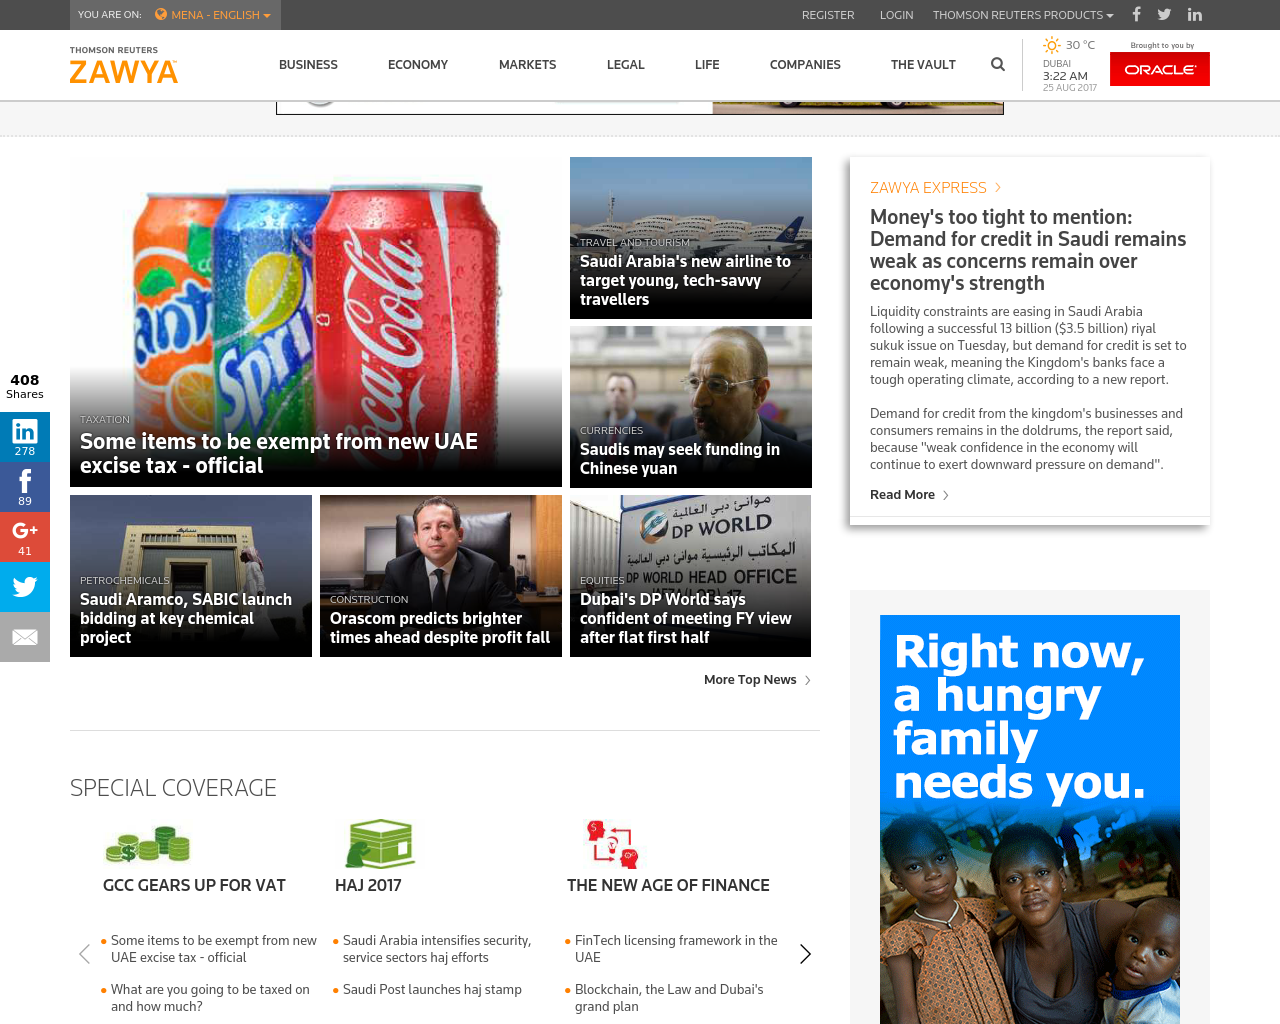 Zawya-Advertising-Reviews-Pricing